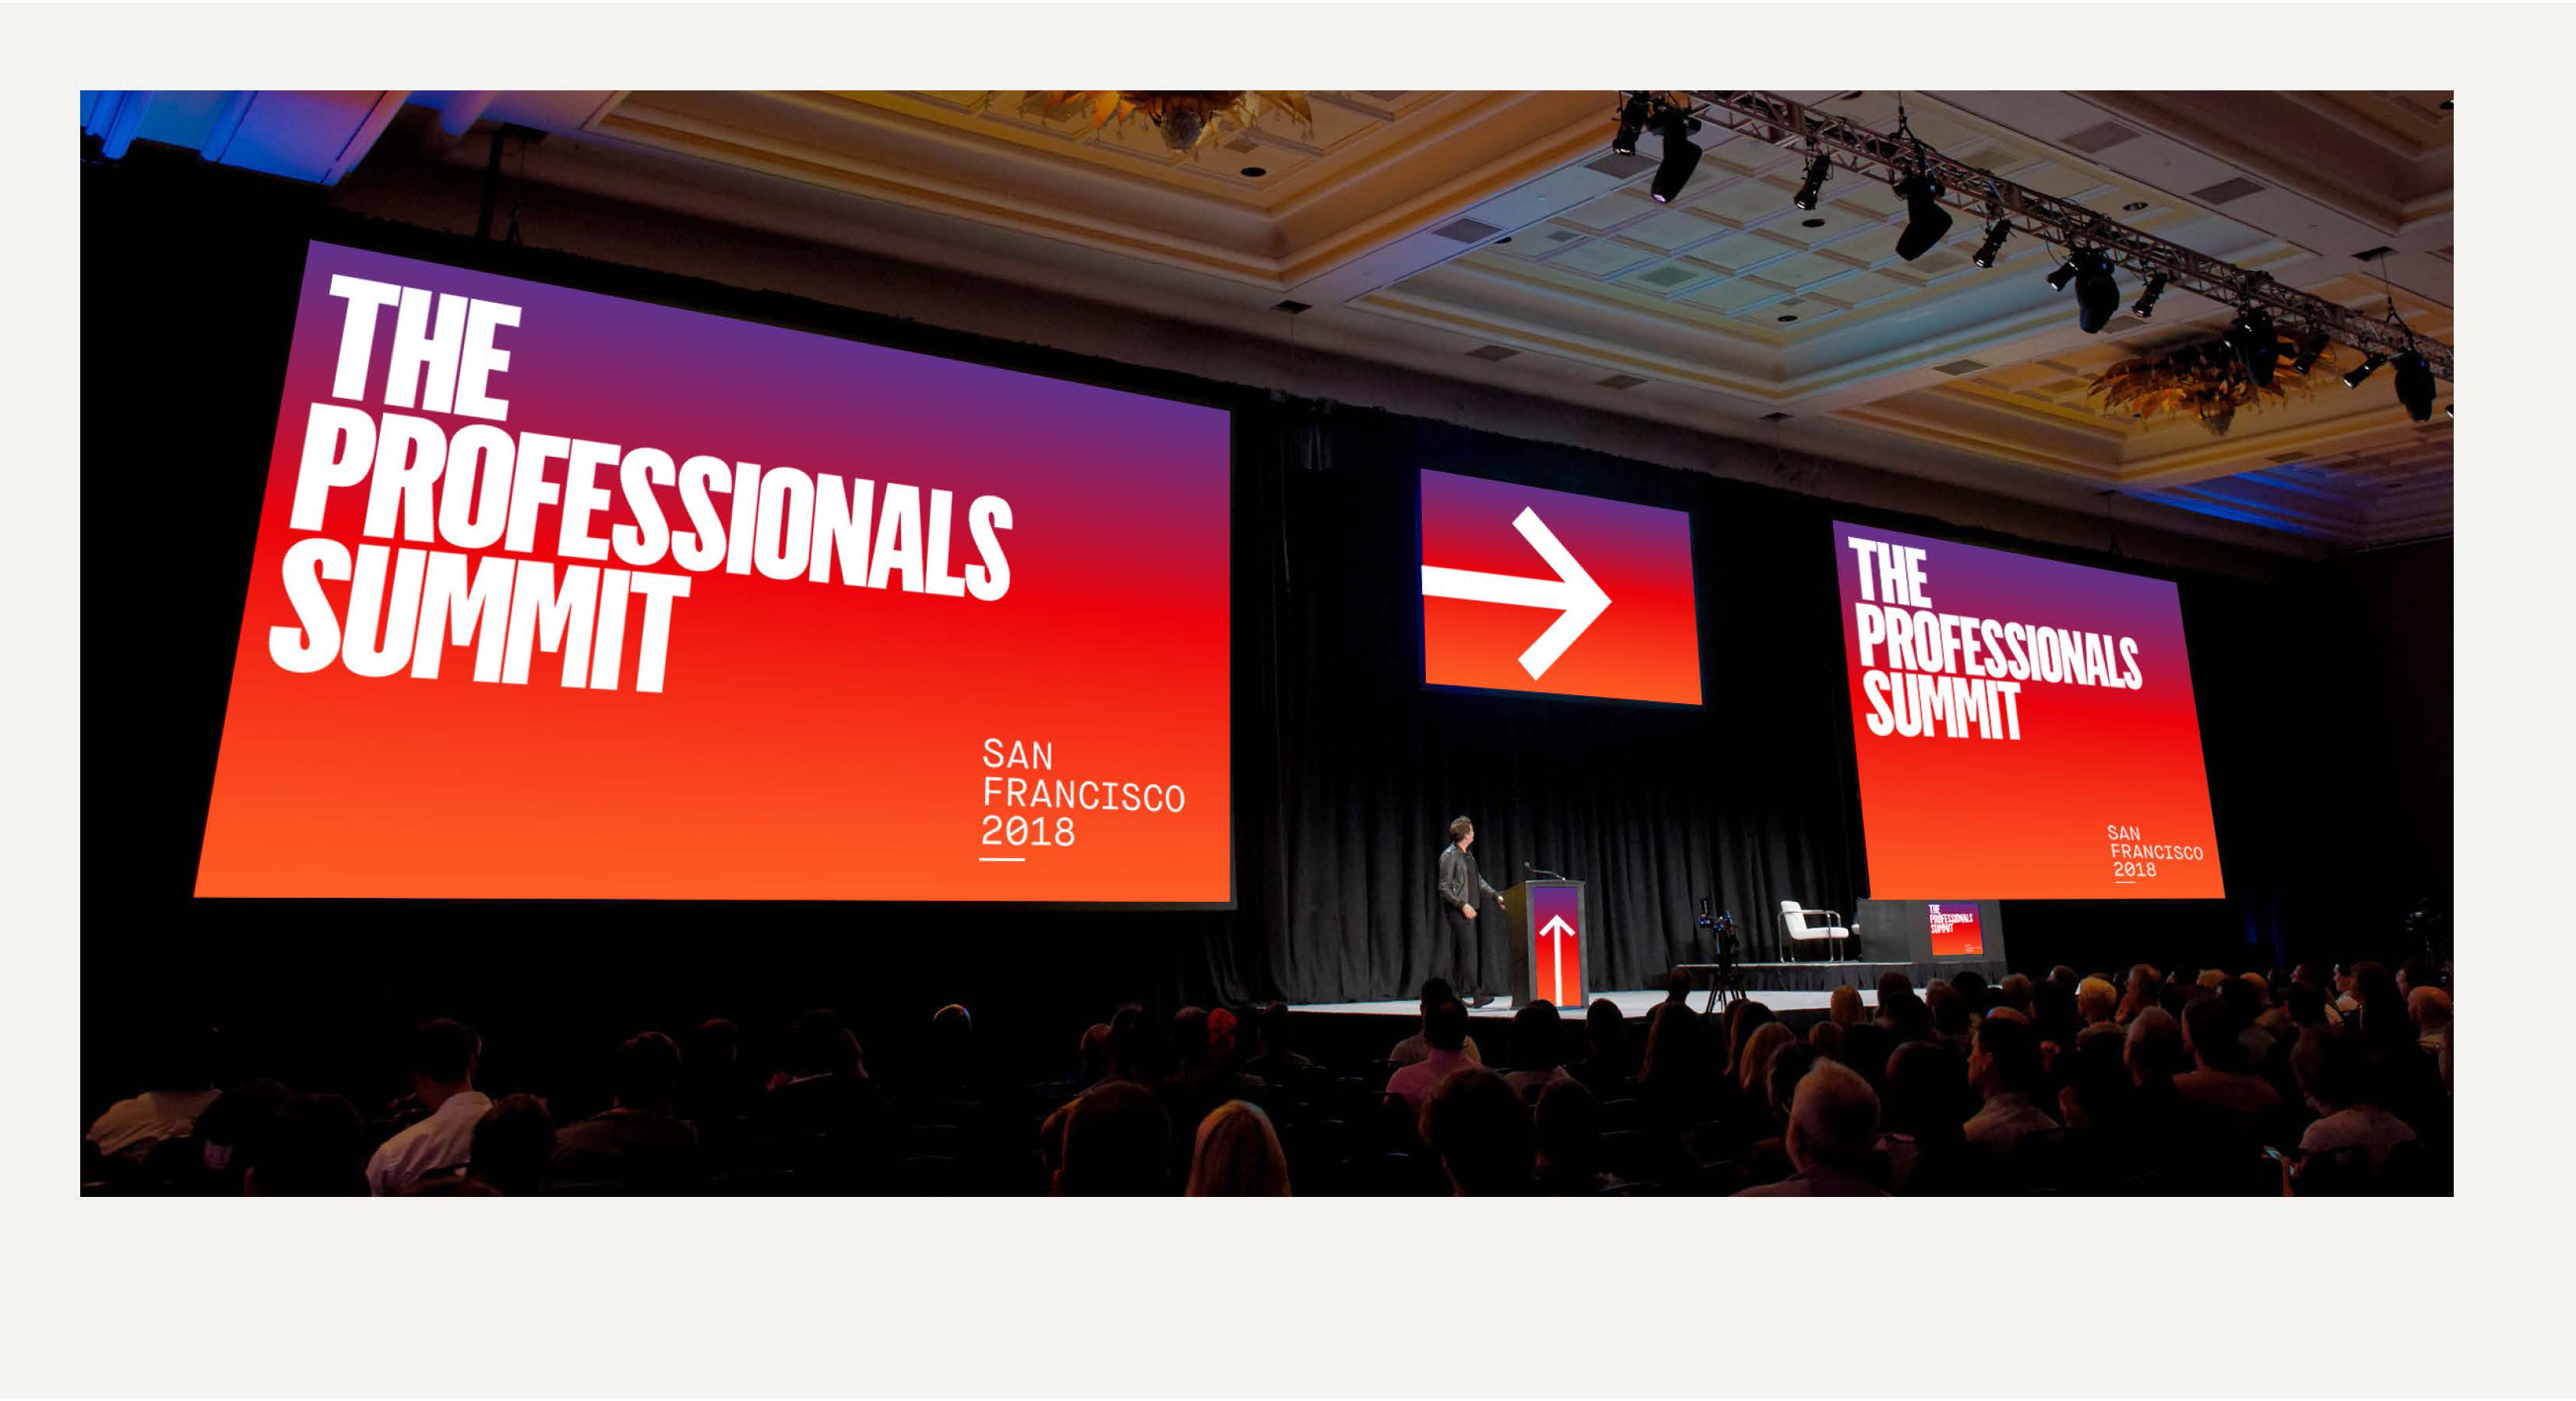 Ludbrook+Garbenis-The-Professionals-Summit-09